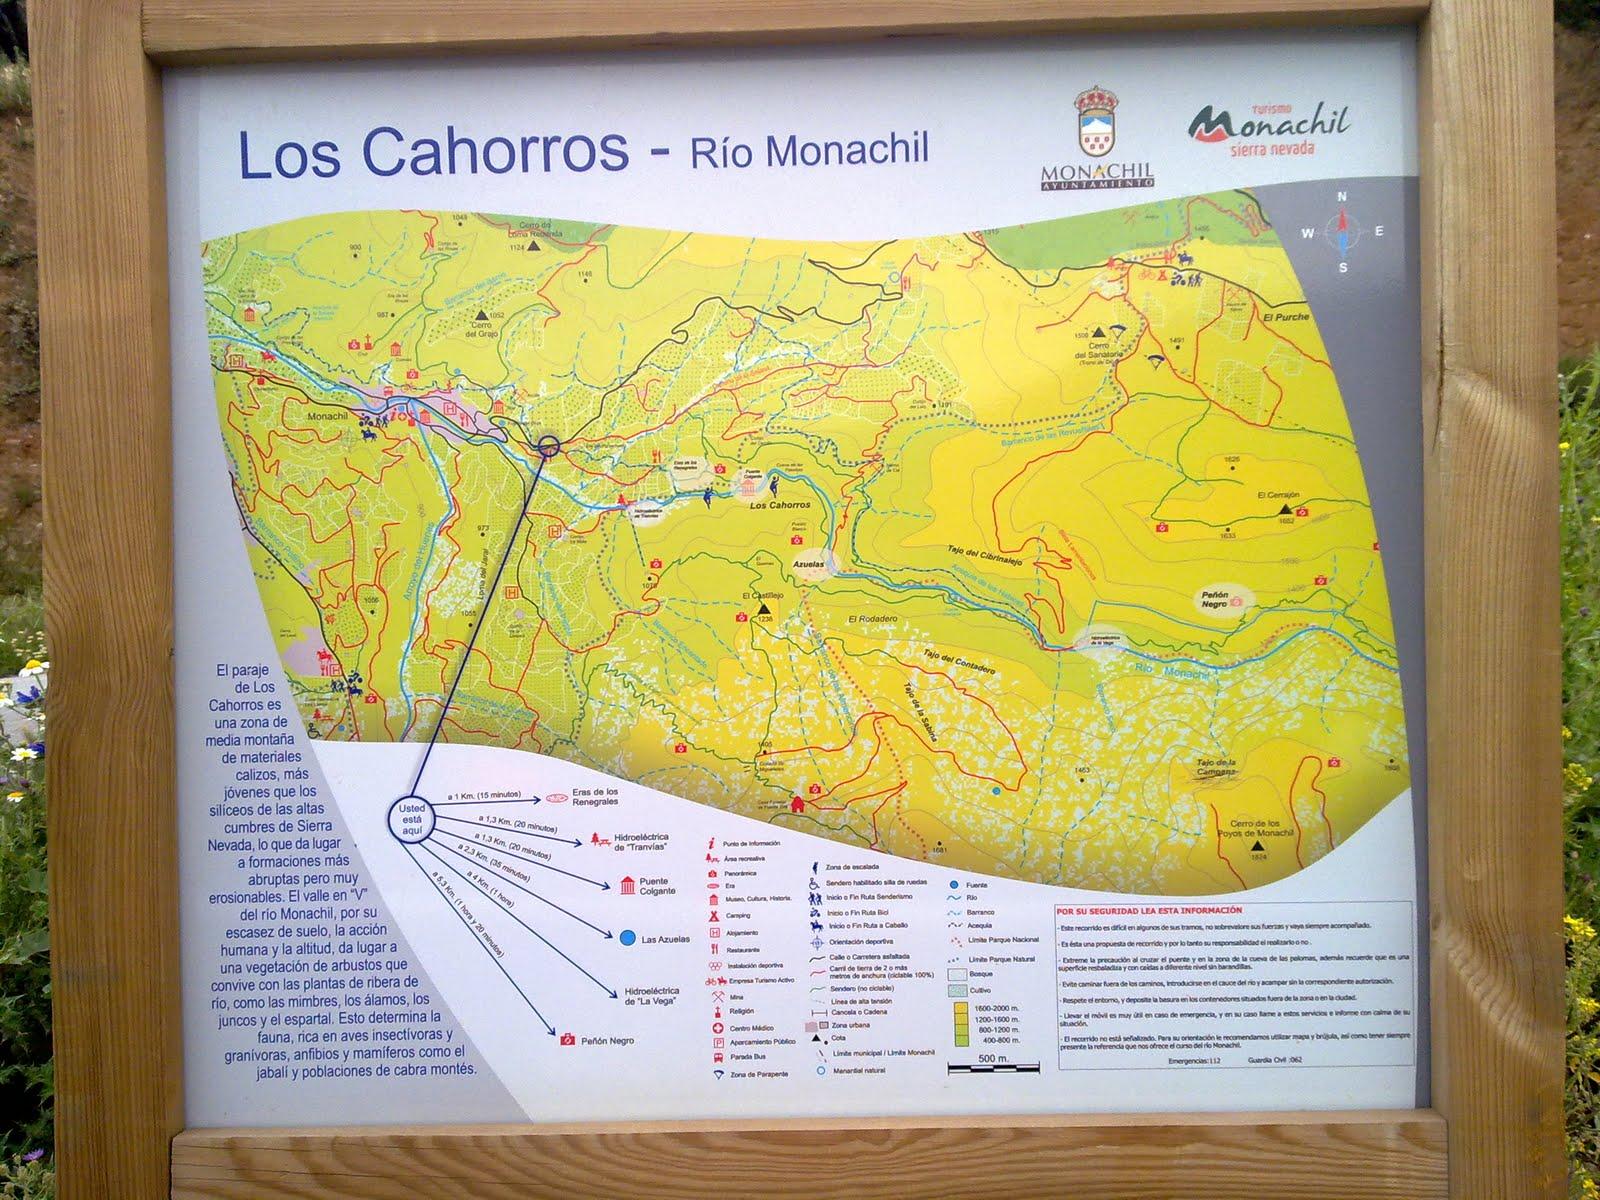 Itinerariun: Ruta Los Cahorros de Monachil